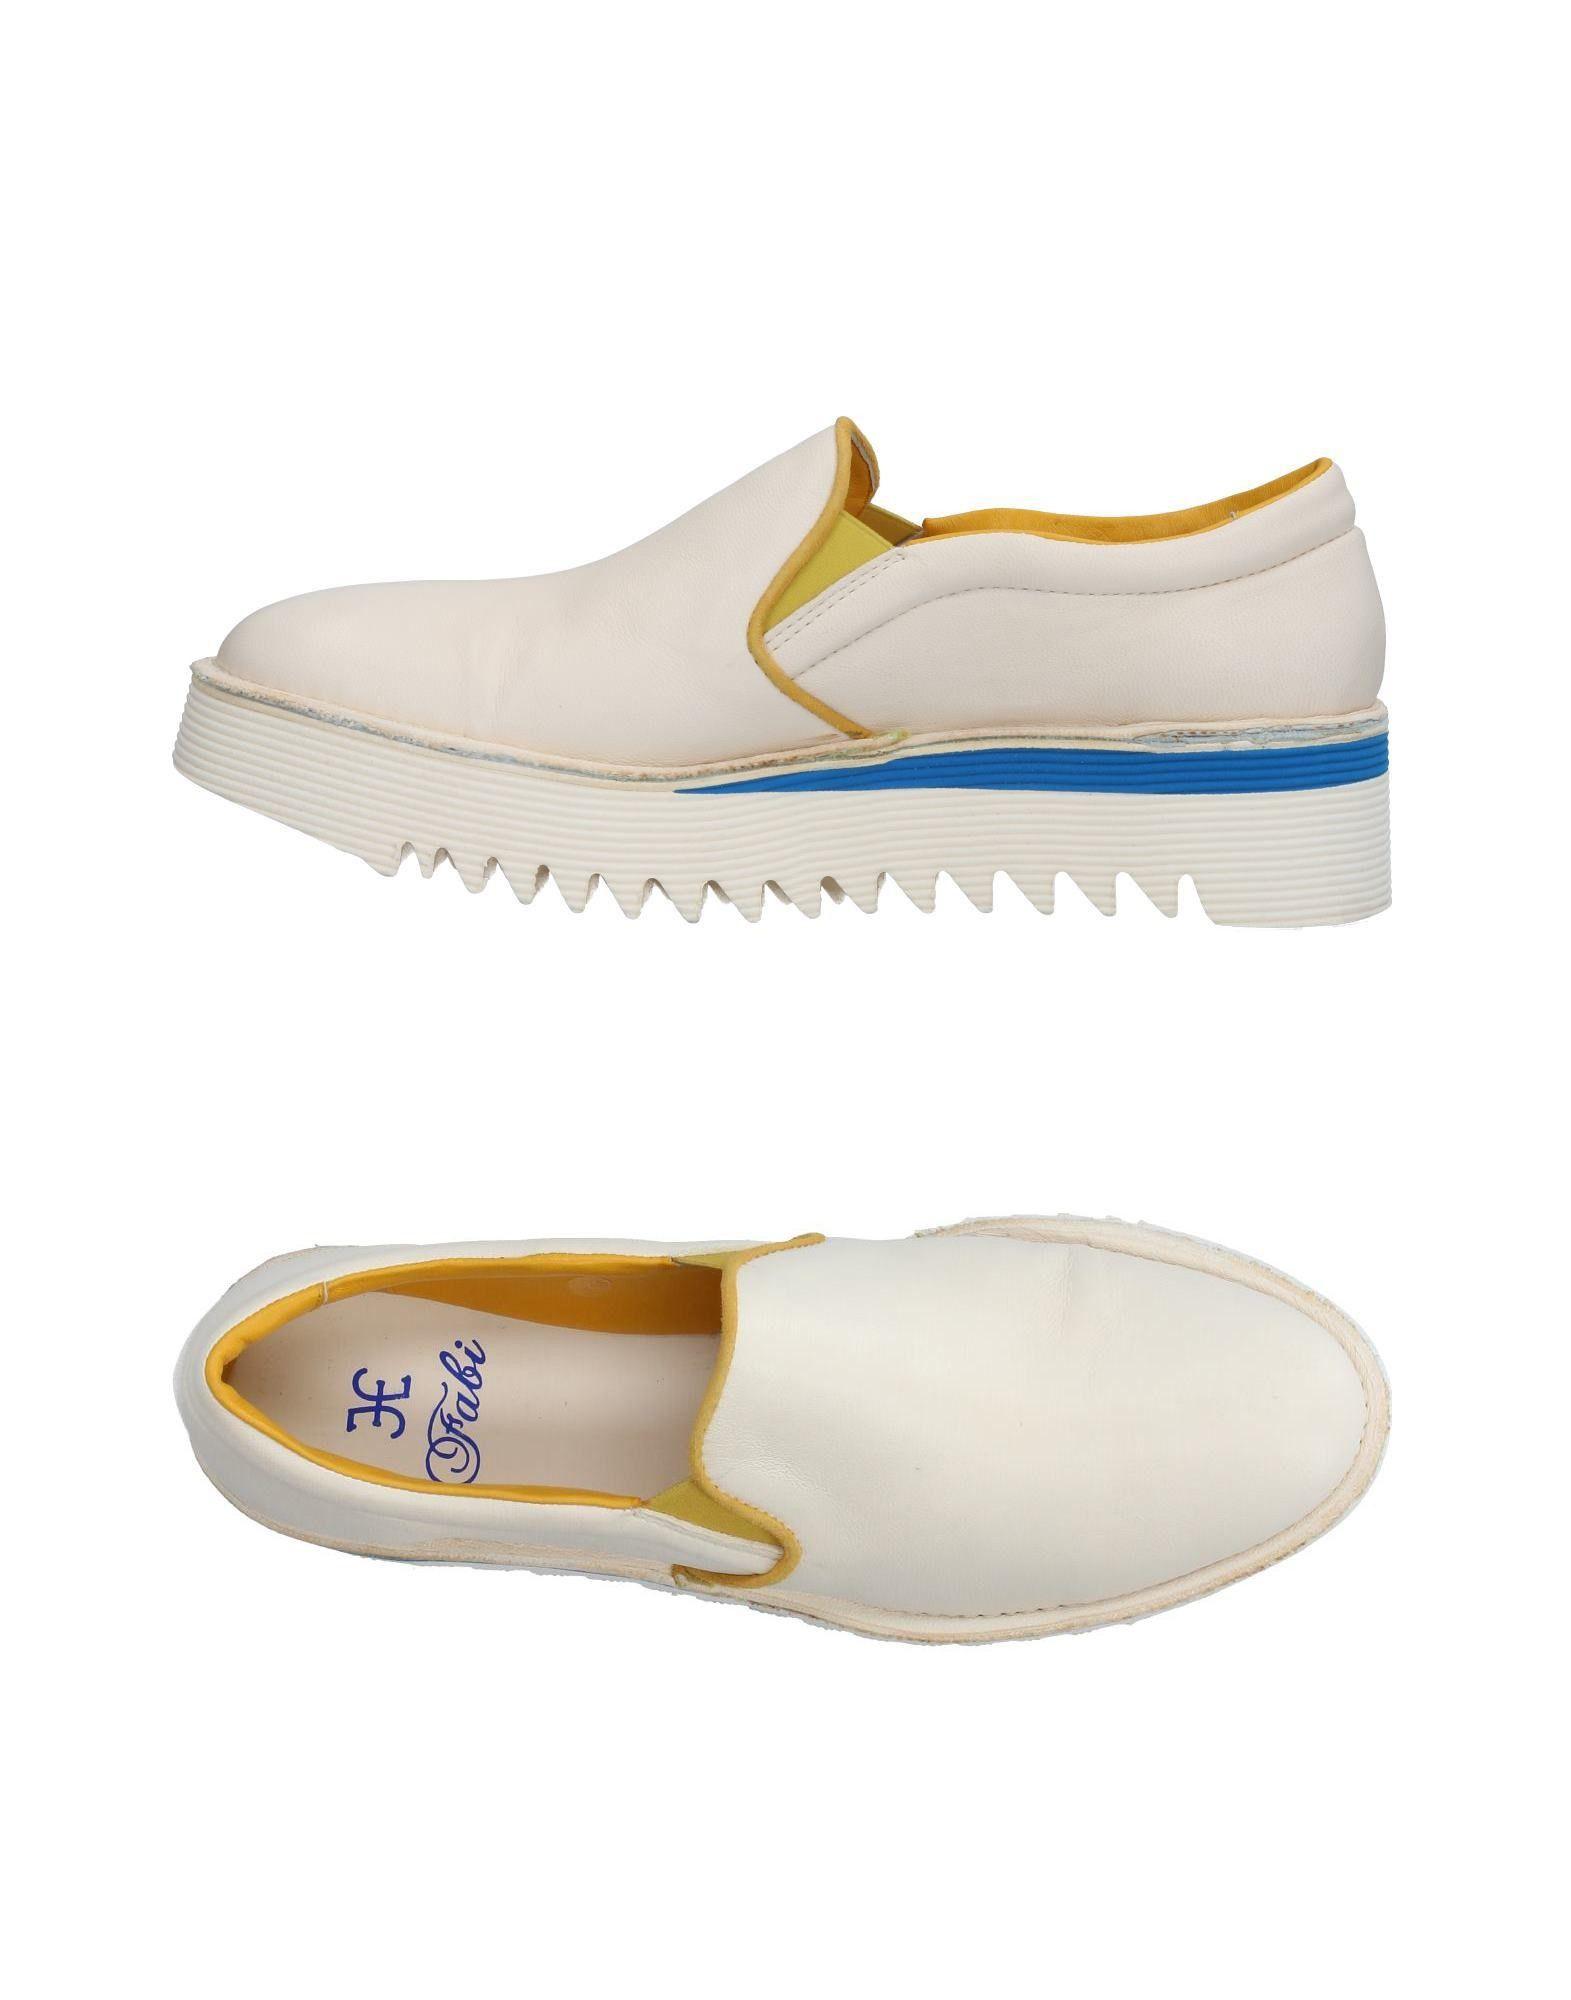 Moda Moda Moda Sneakers Fabi Donna - 11416060UK a5aaf9